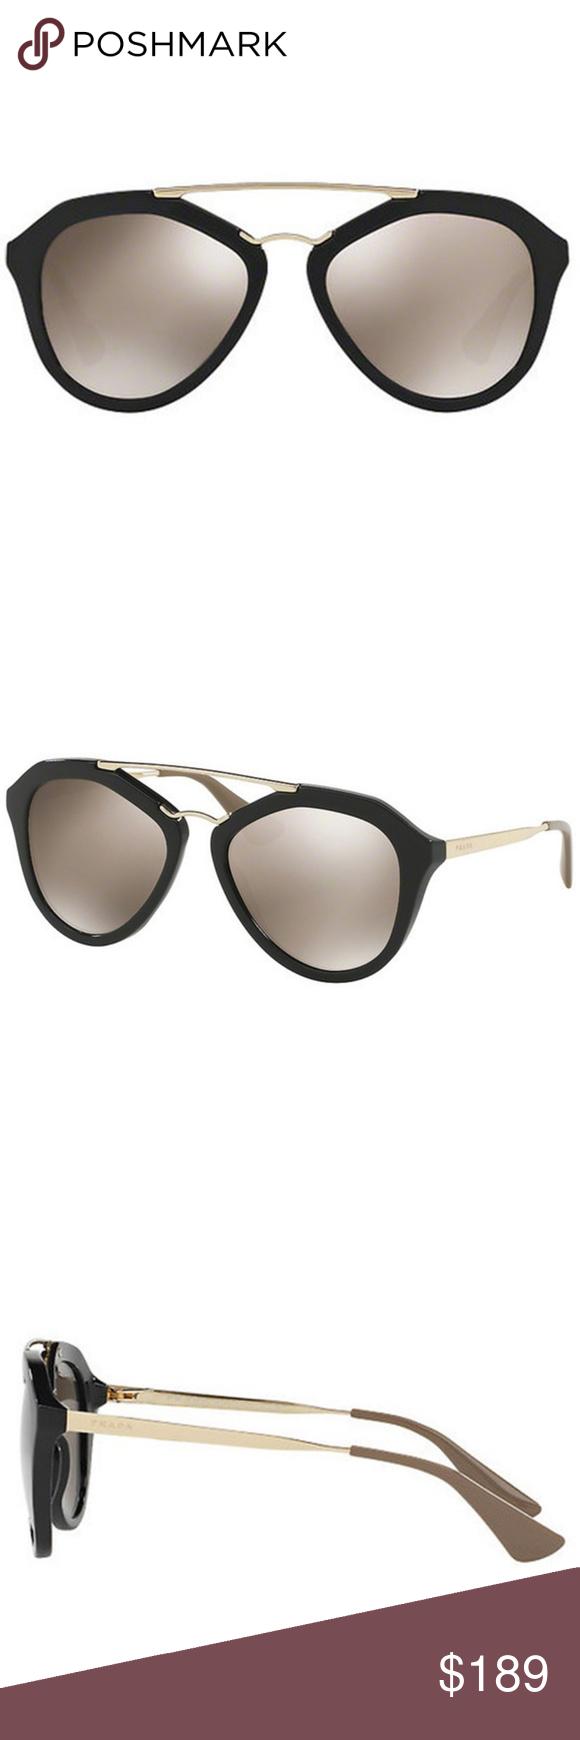 28c0de9a8ada Prada Sunglasses Cinema Black w Brown Mirror Gold Prada Pilot Style Women s  Sunglasses 54mm Lens Size Having Black Color Plastic   Metal Frame with  Light ...